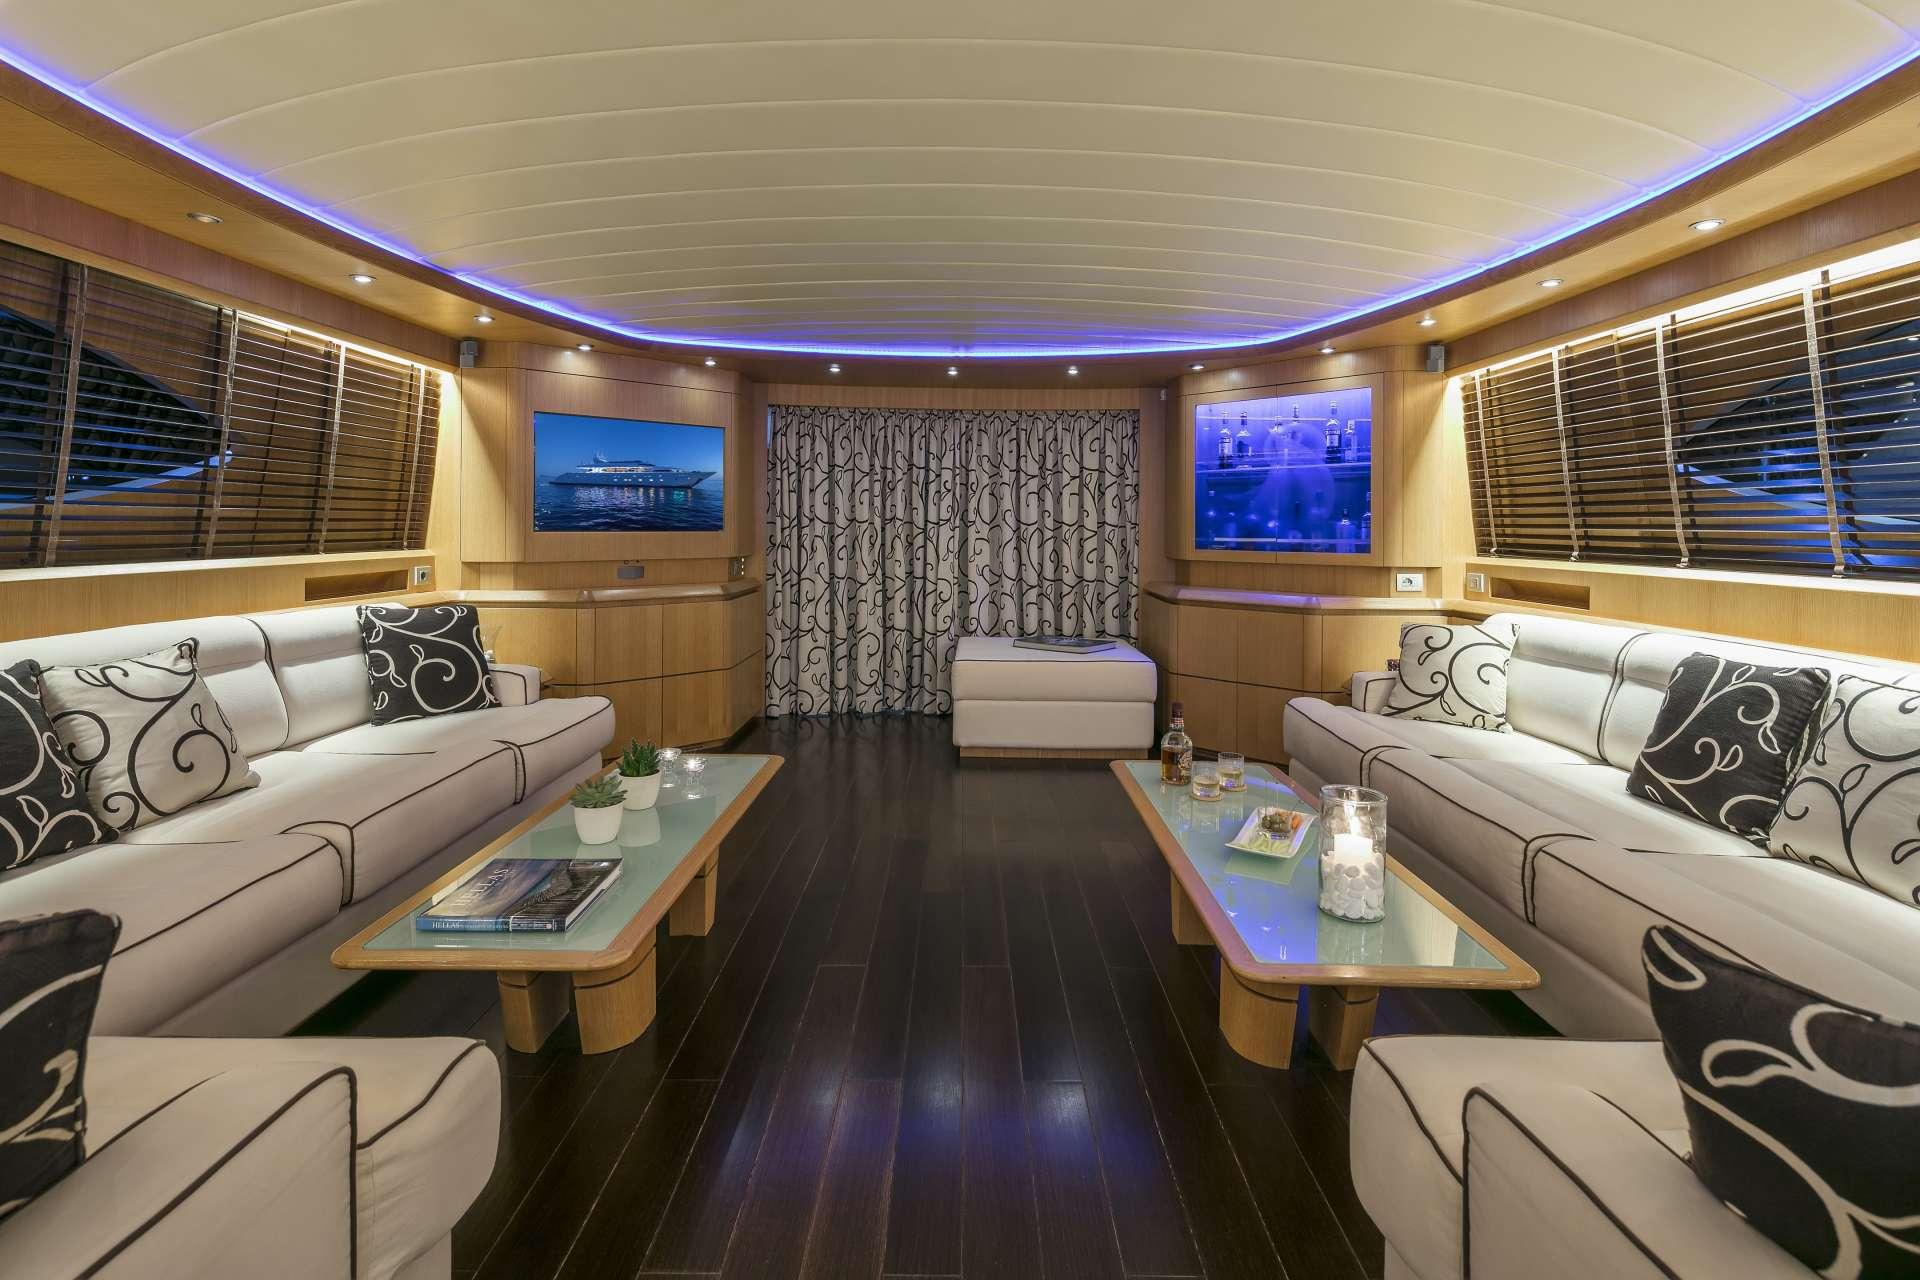 Motor Yacht 'PARIS A', 12 PAX, 6 Crew, 115.00 Ft, 35.06 Meters, Built 2009, Majora, Refit Year 2013